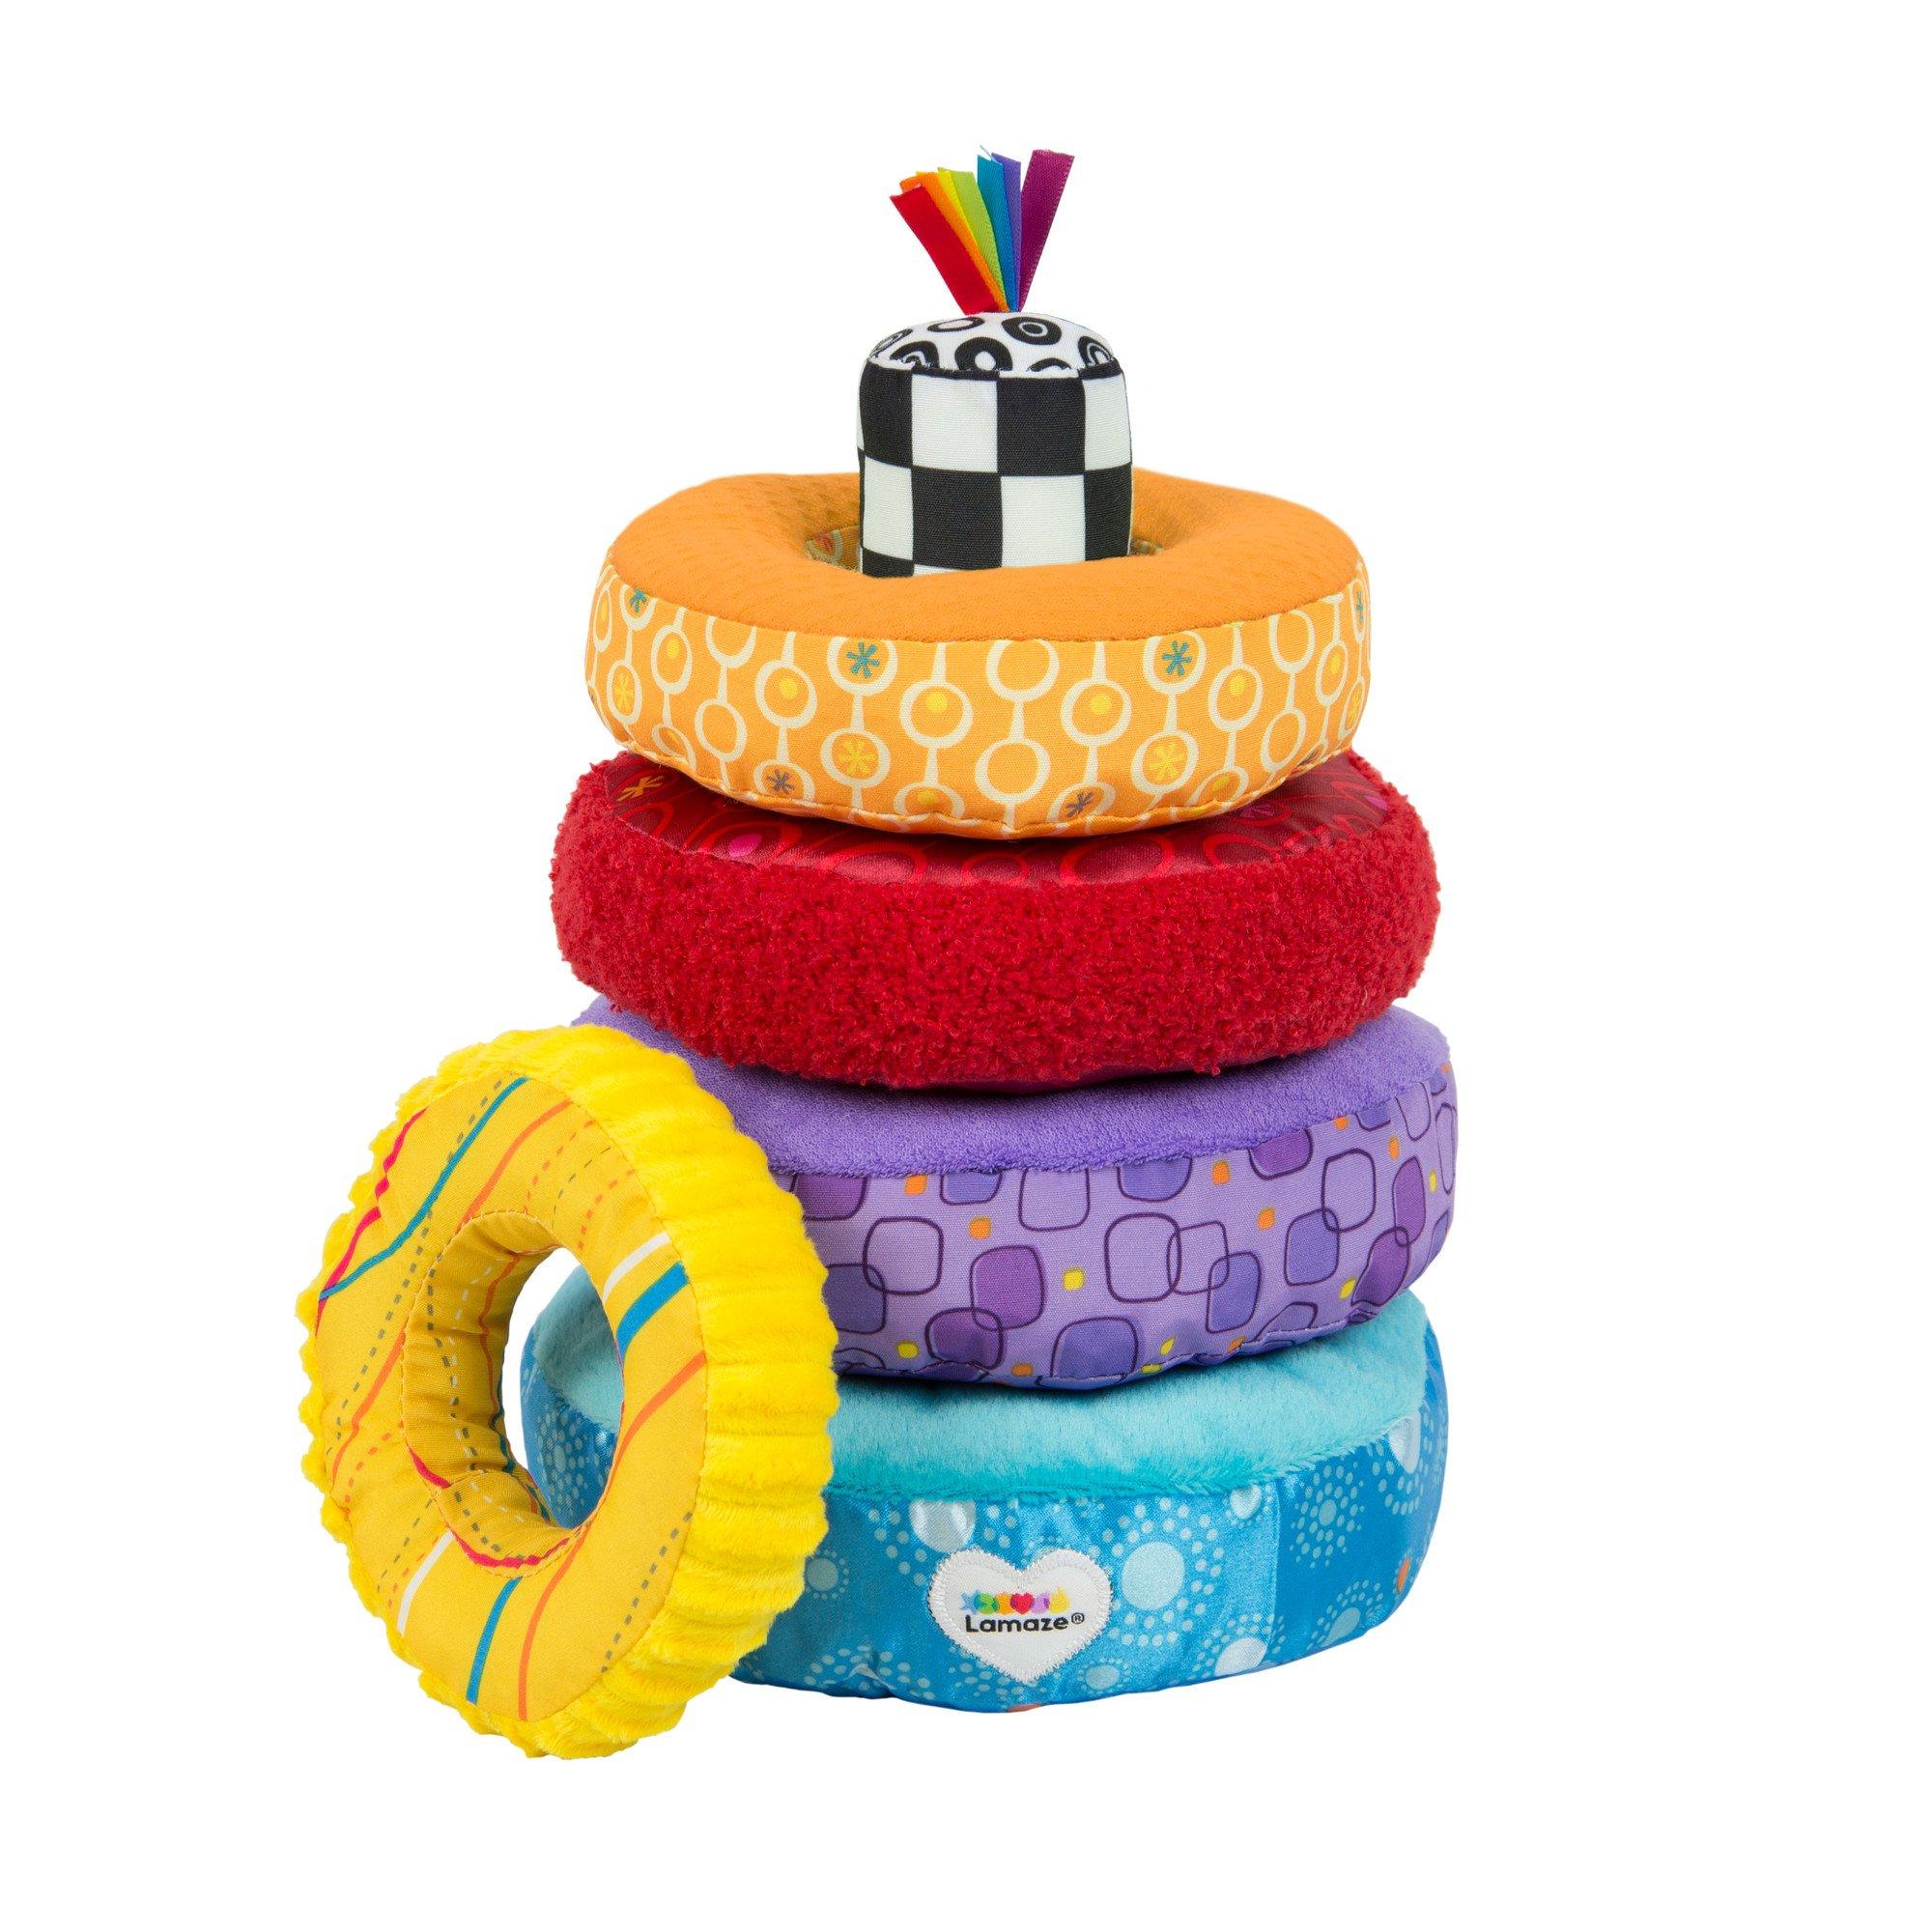 Amazon.com : Lamaze - My First Fishbowl Toy, Capture Baby\'s ...